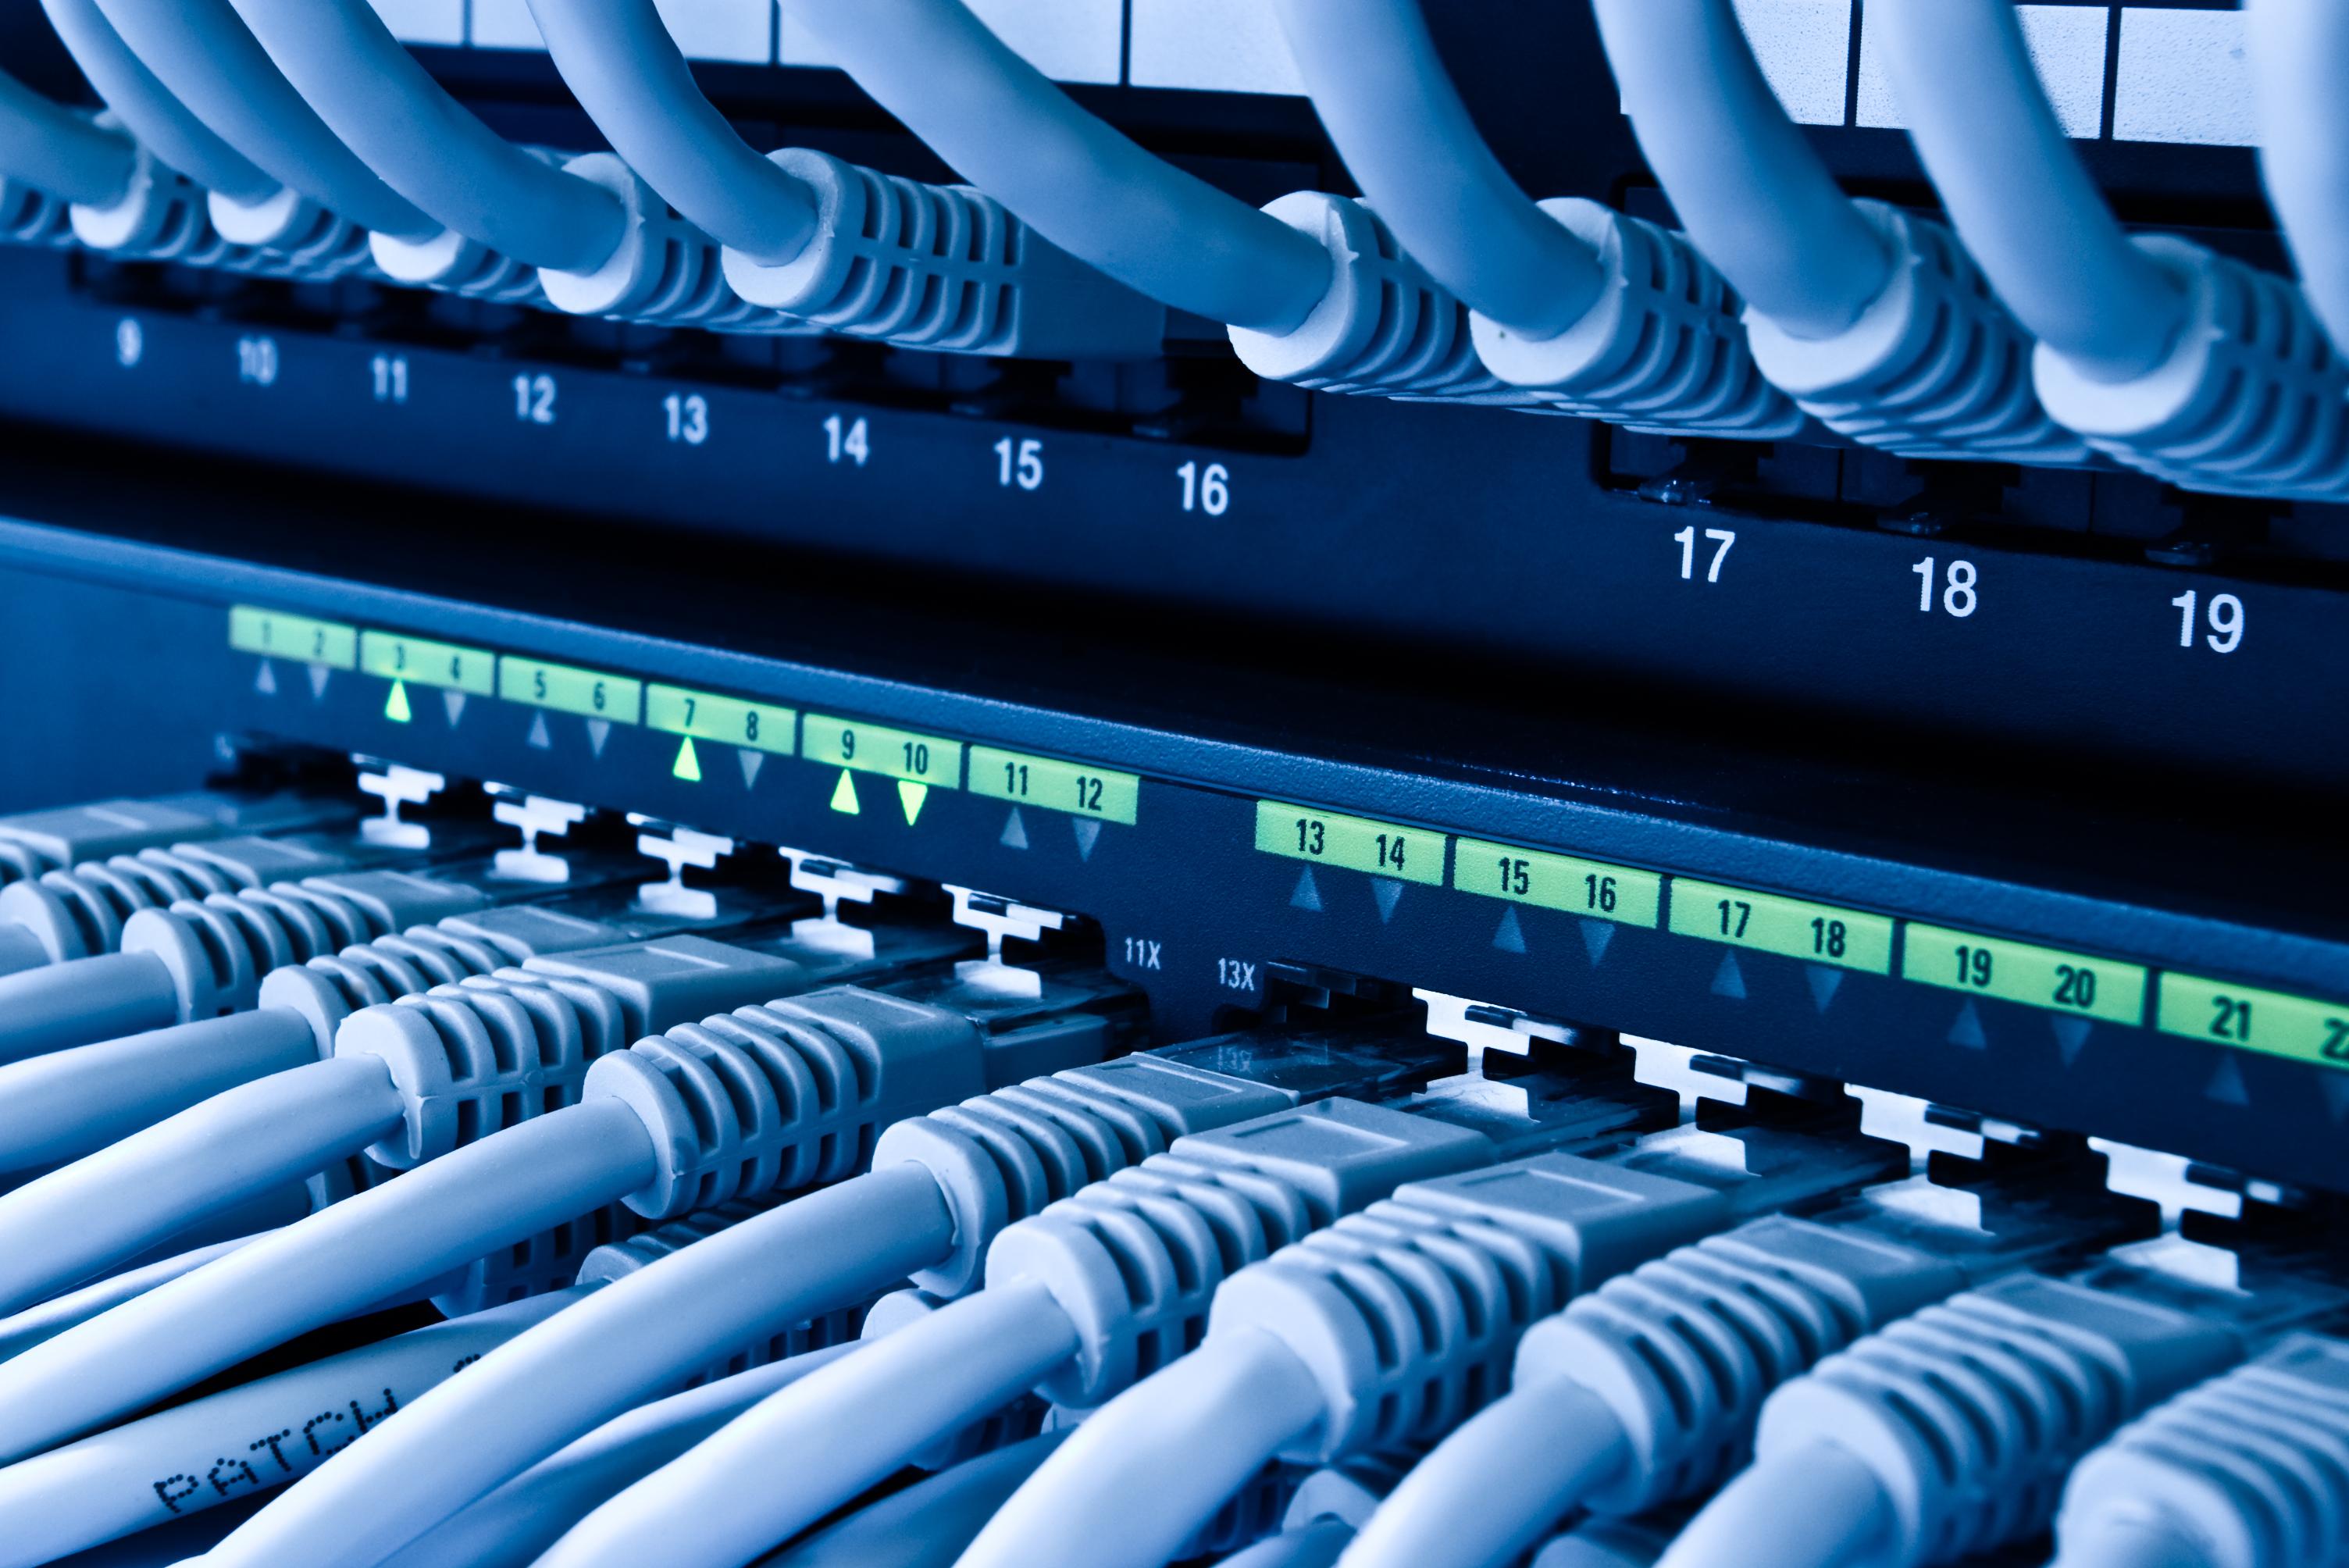 How to Factory Reset a HP Procurve / Aruba Switch – HP